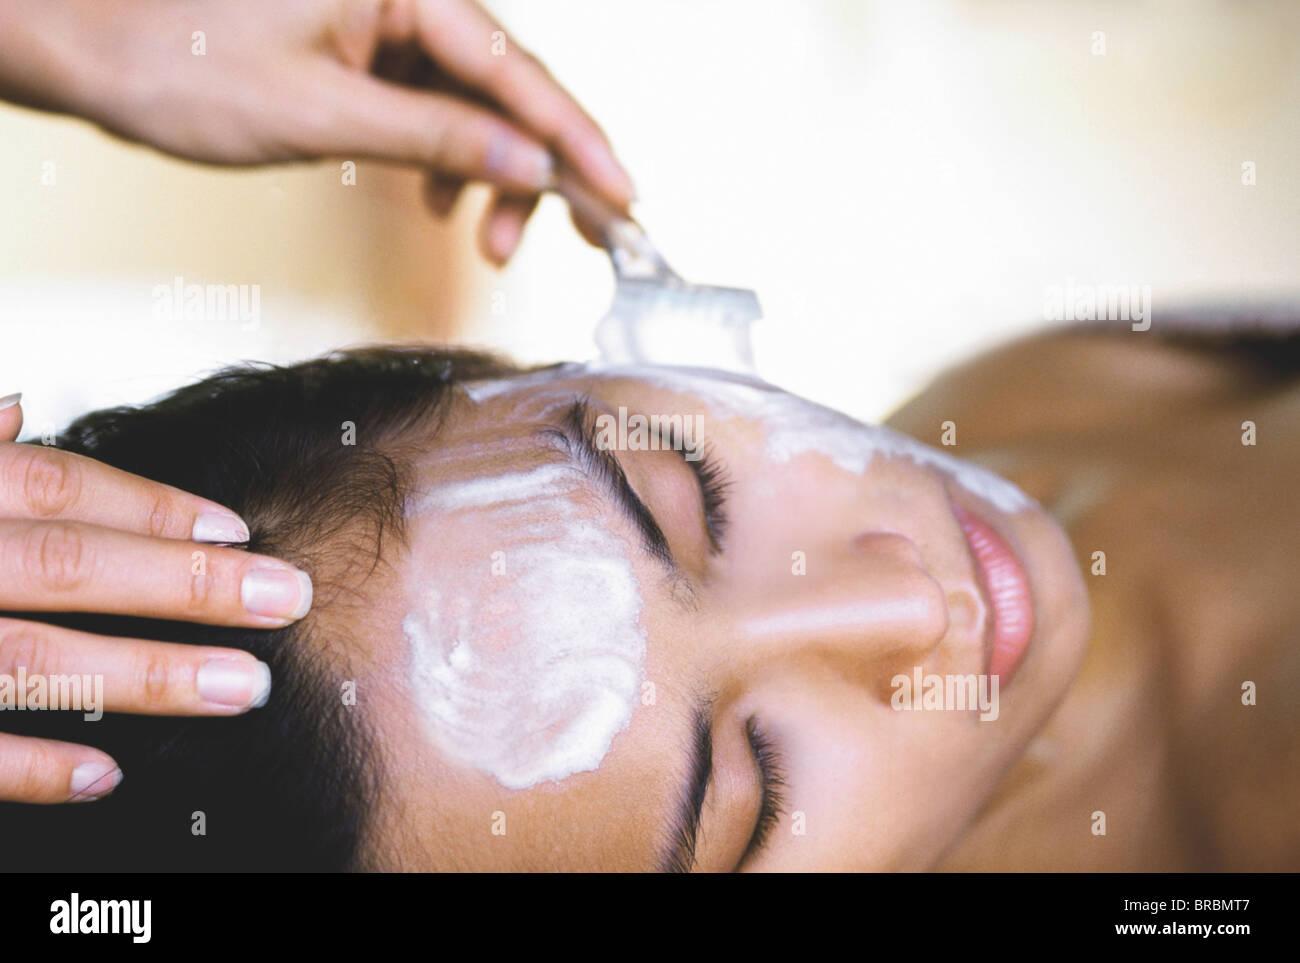 Woman having a facial, Kirana Spa, Indonesia - Stock Image